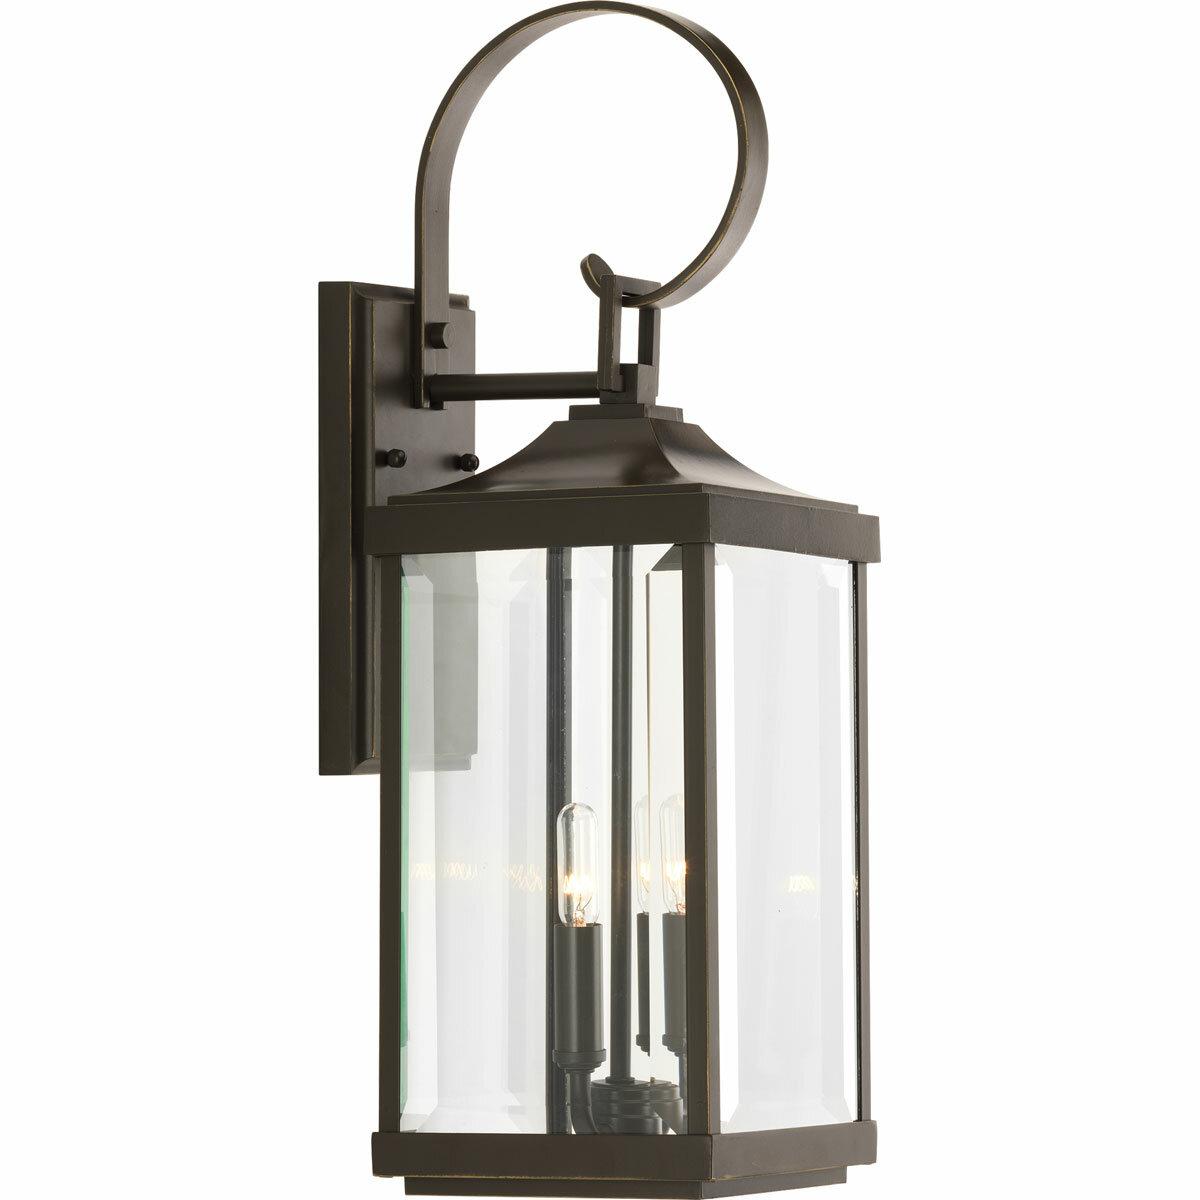 Kinlaw 2 Light Outdoor Wall Lantern Reviews Joss Main